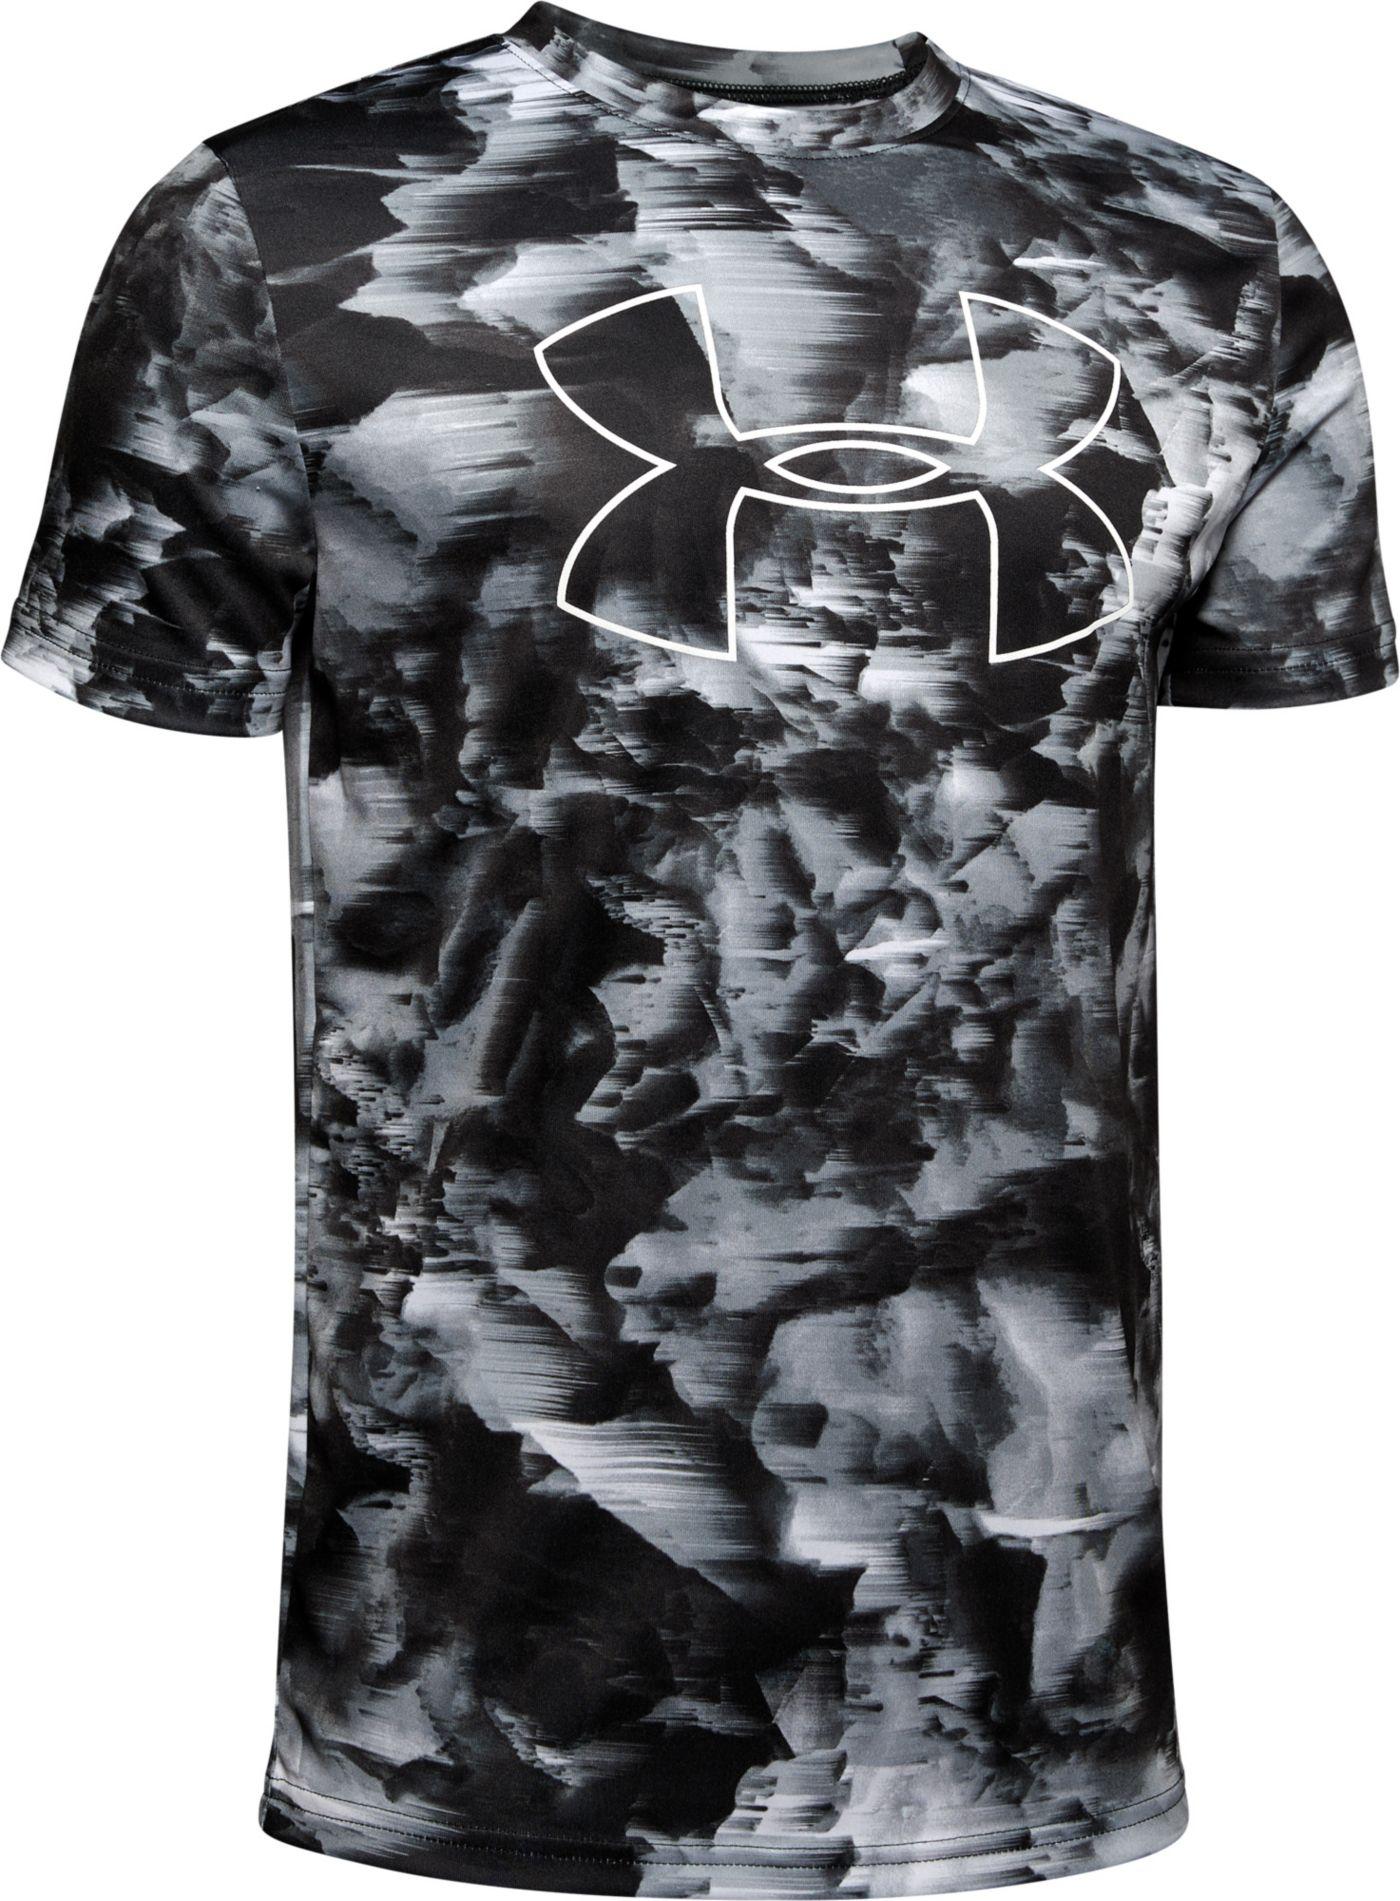 Under Armour Boy's Printed Big Logo T-Shirt